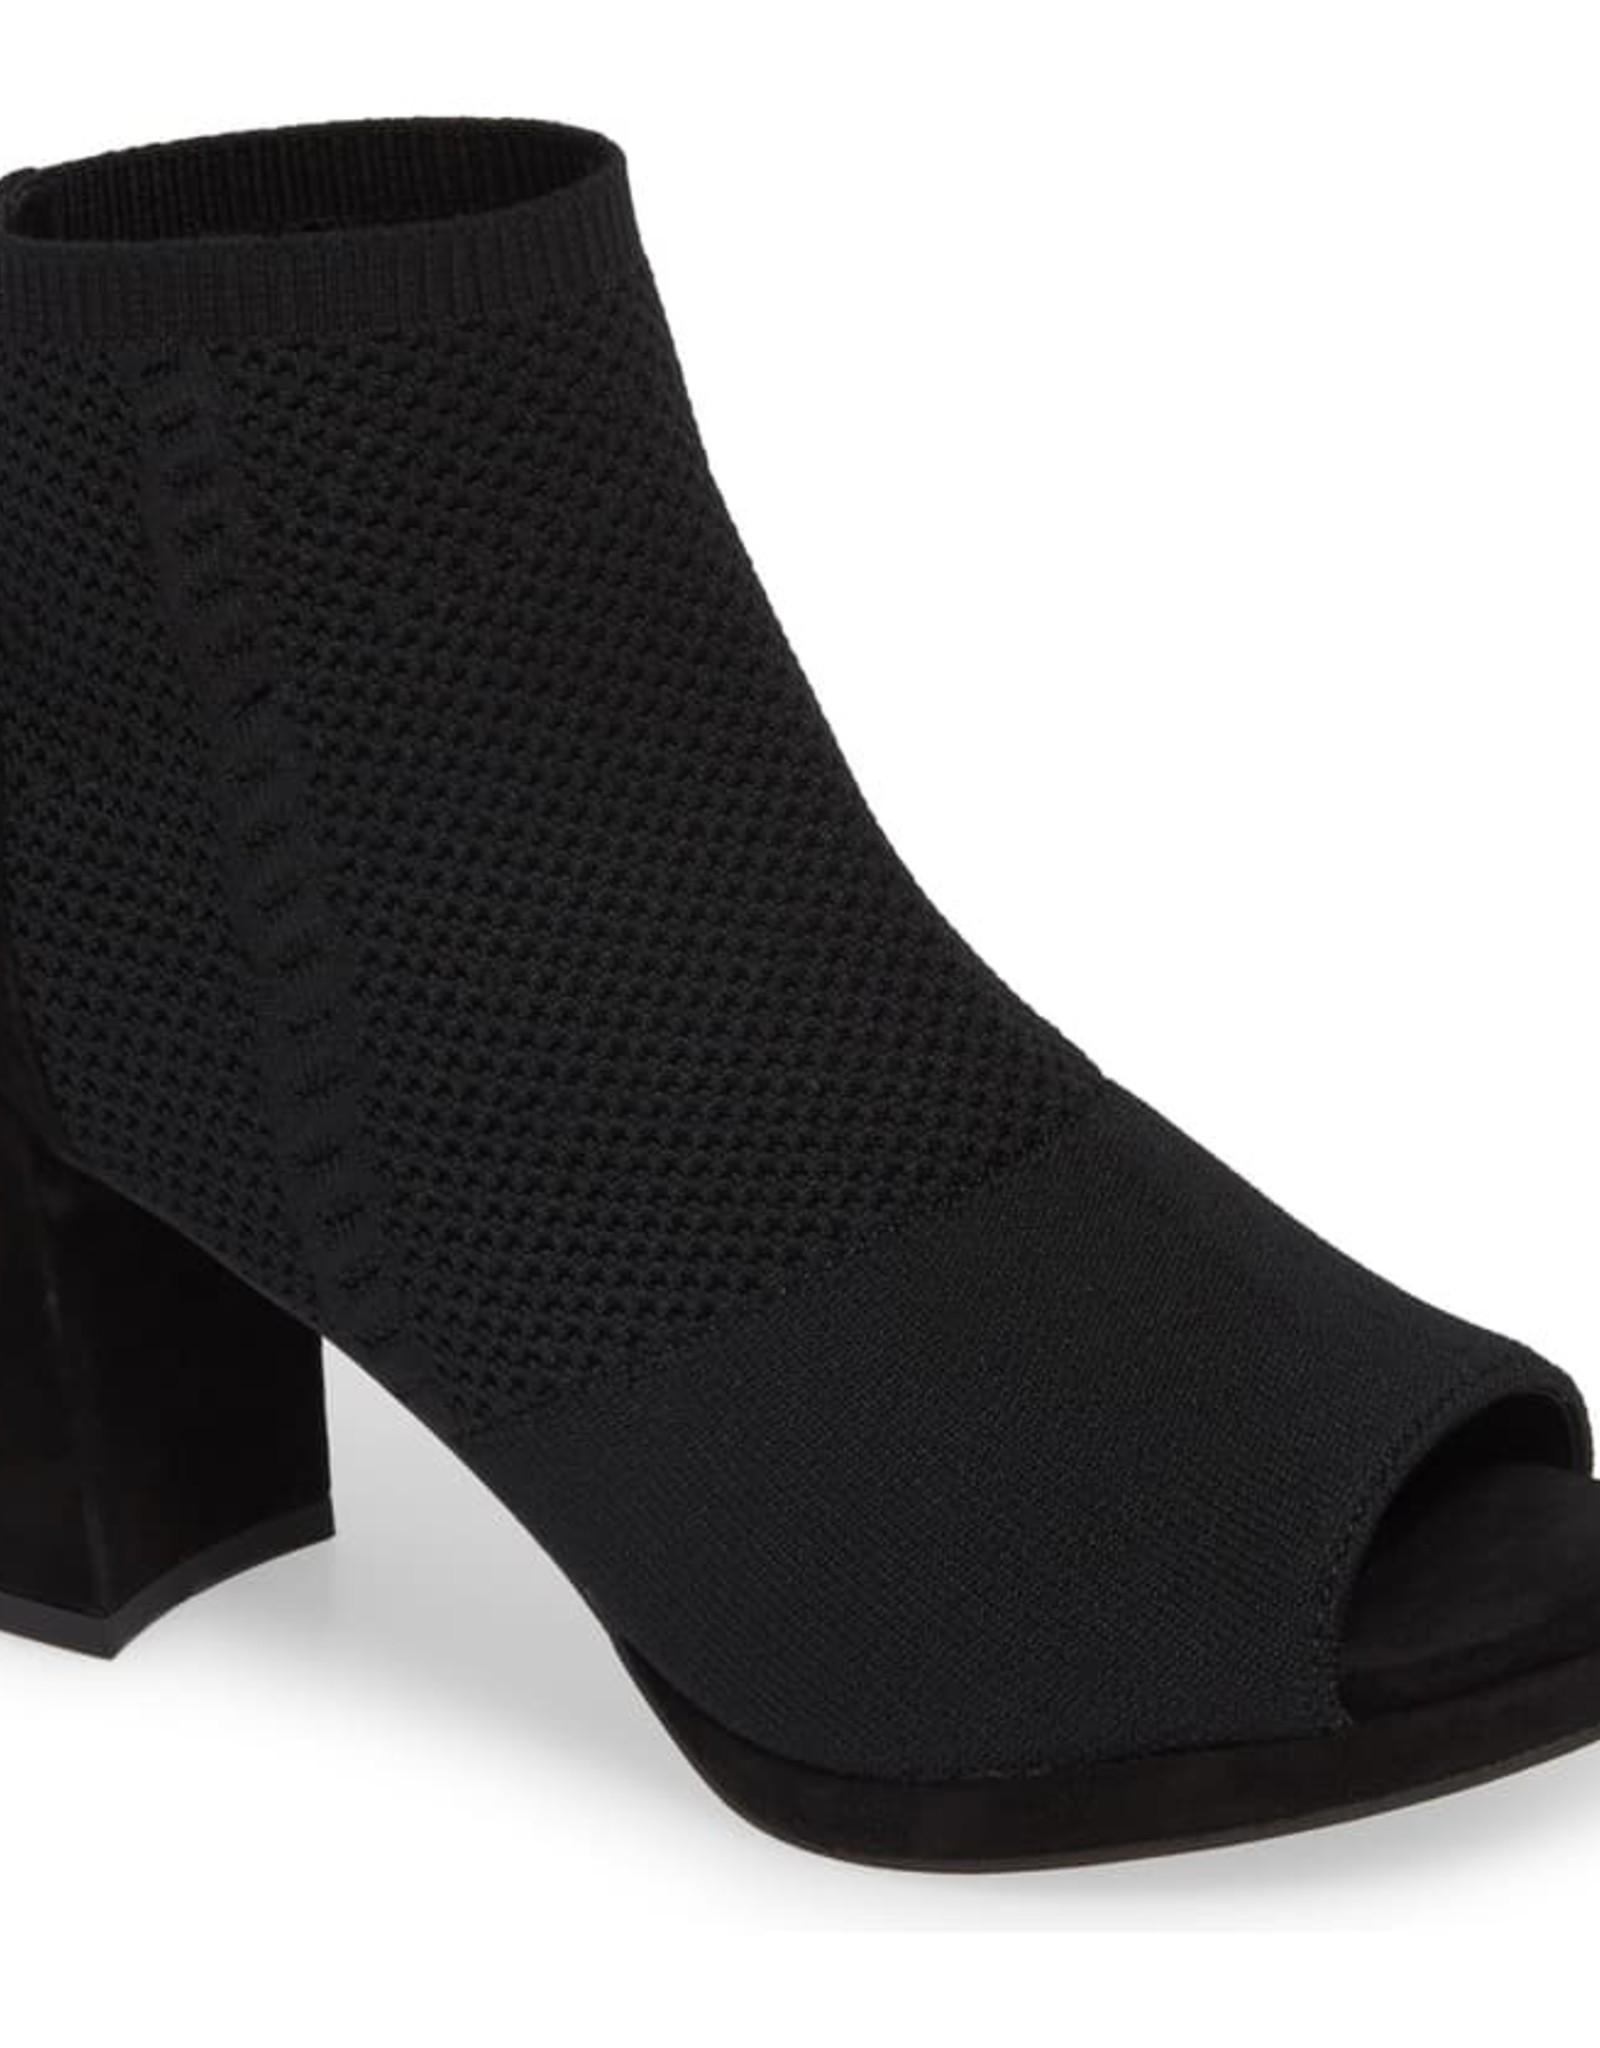 Eileen Fisher - Margate Peep Toe Bootie